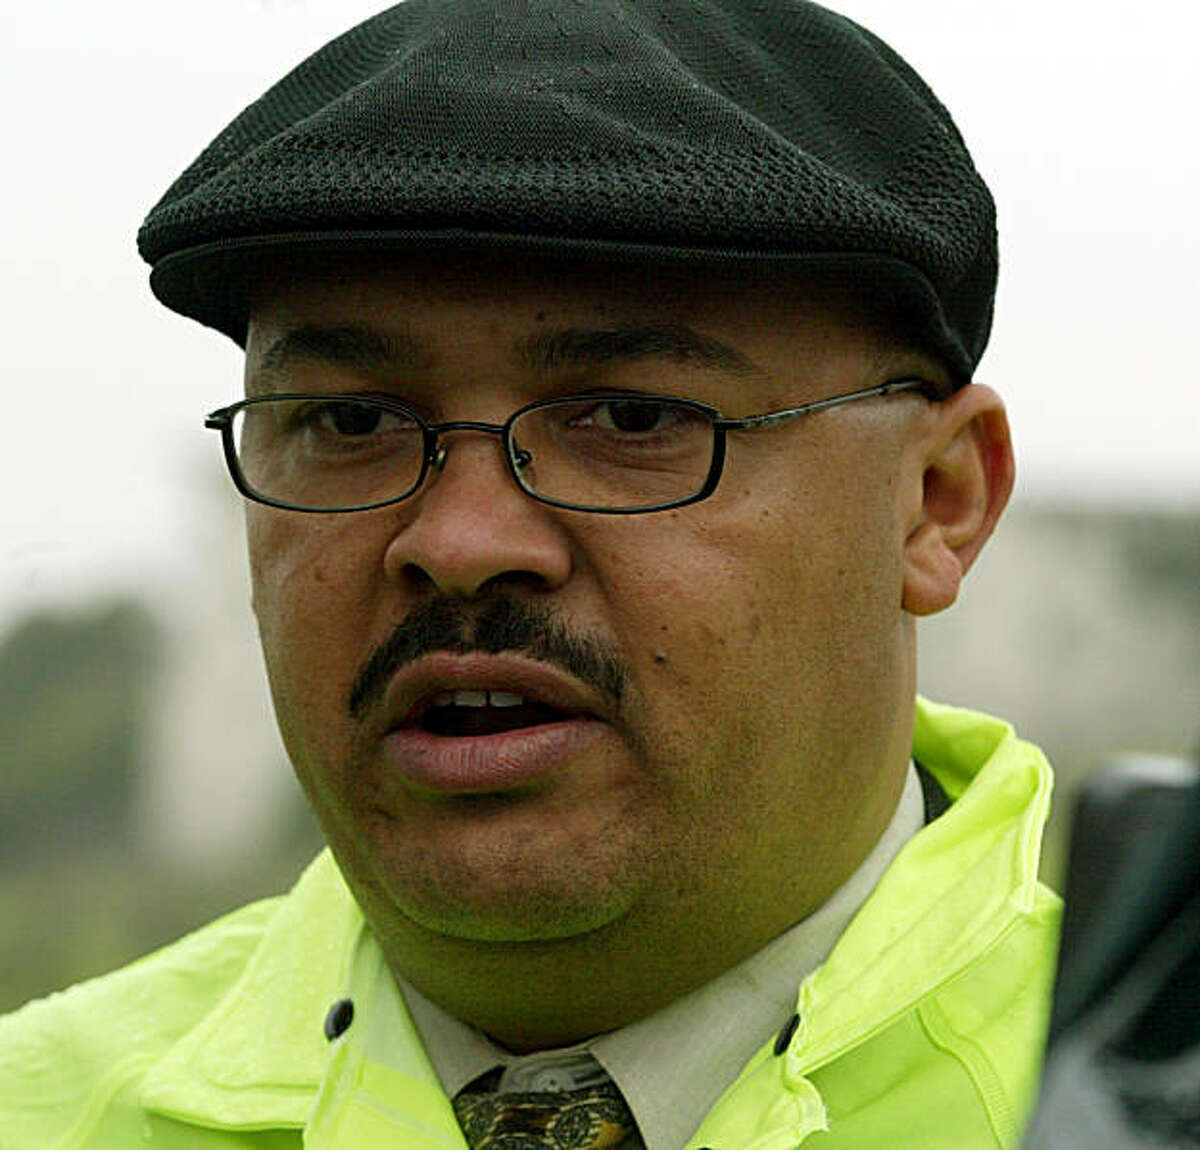 Mohammed Nuru, deputy director of San Francisco's Department of Public Works,